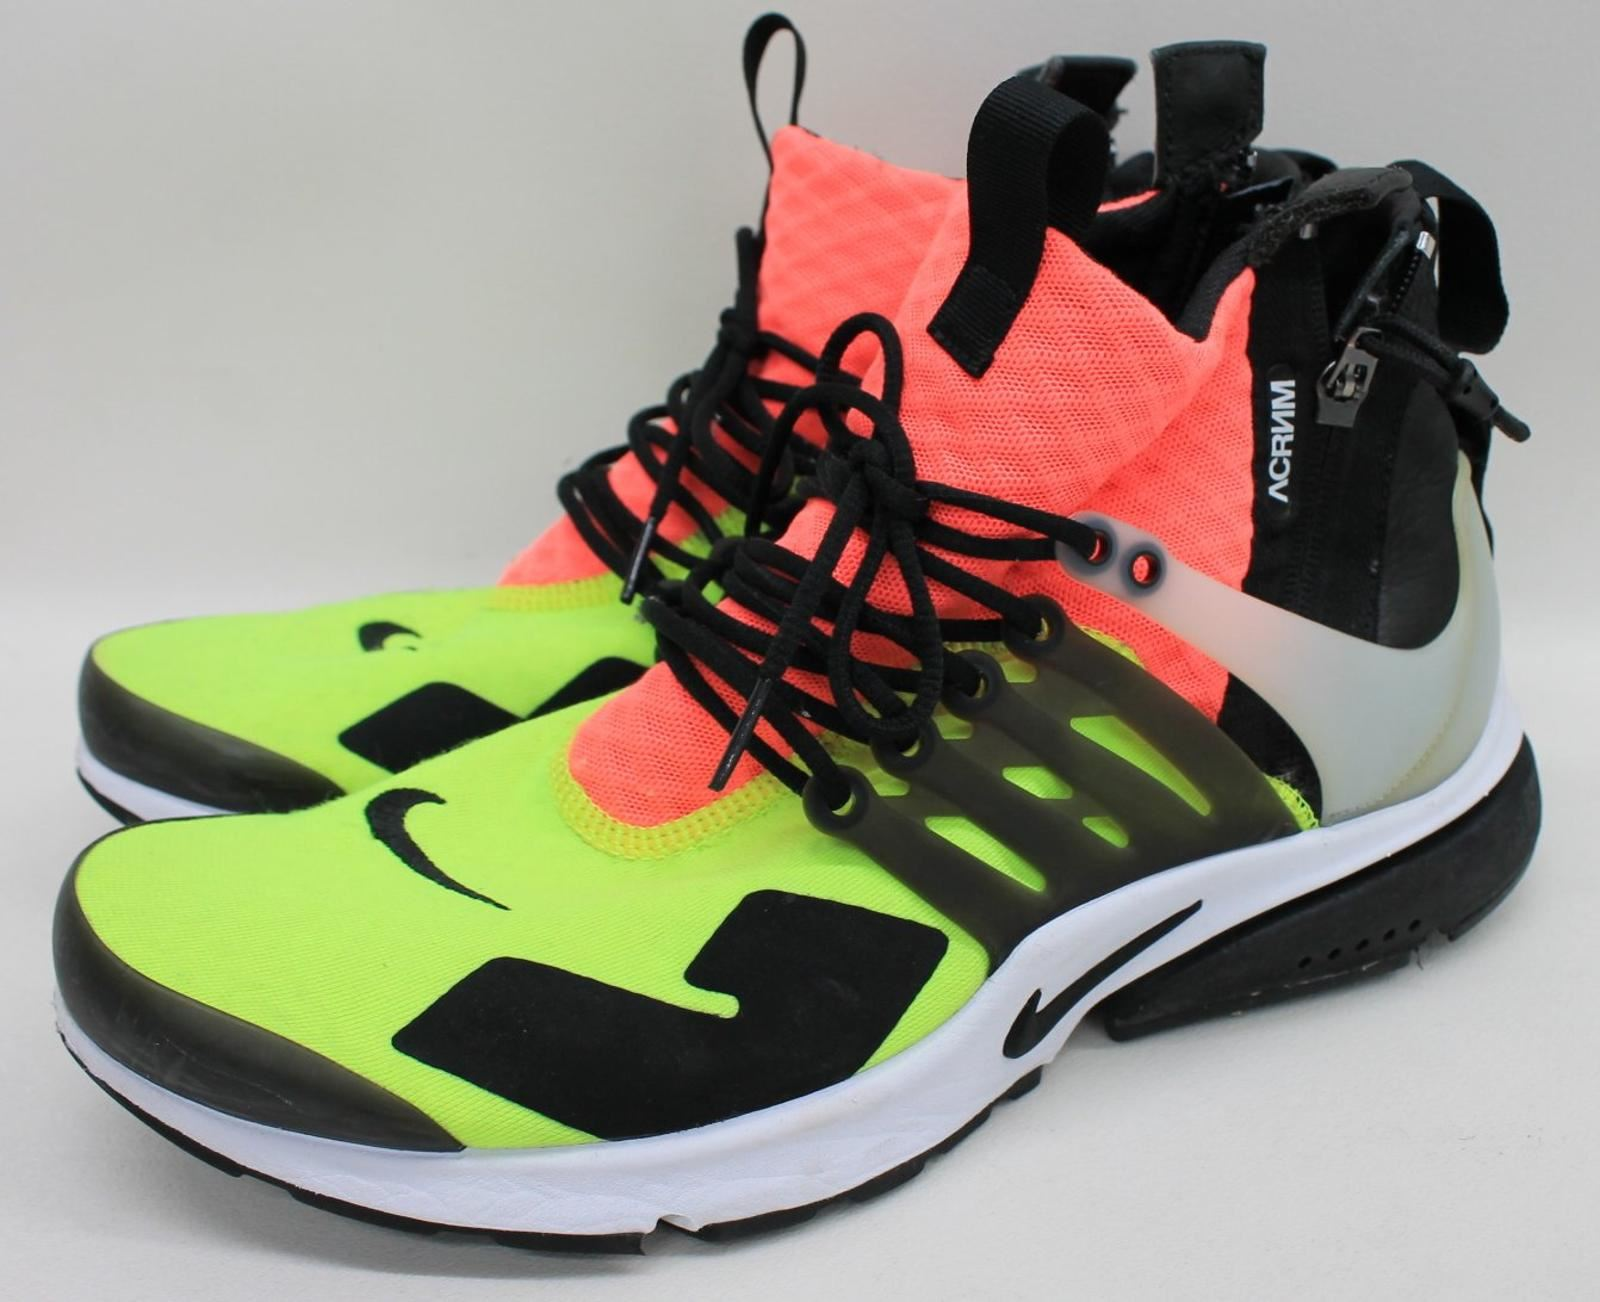 best website 86b67 63be0 da Uk9 Presto ginnastica Acronym Mid uomo medio X Lava Volt Scarpe Air Hot  Nike Uk10 ...